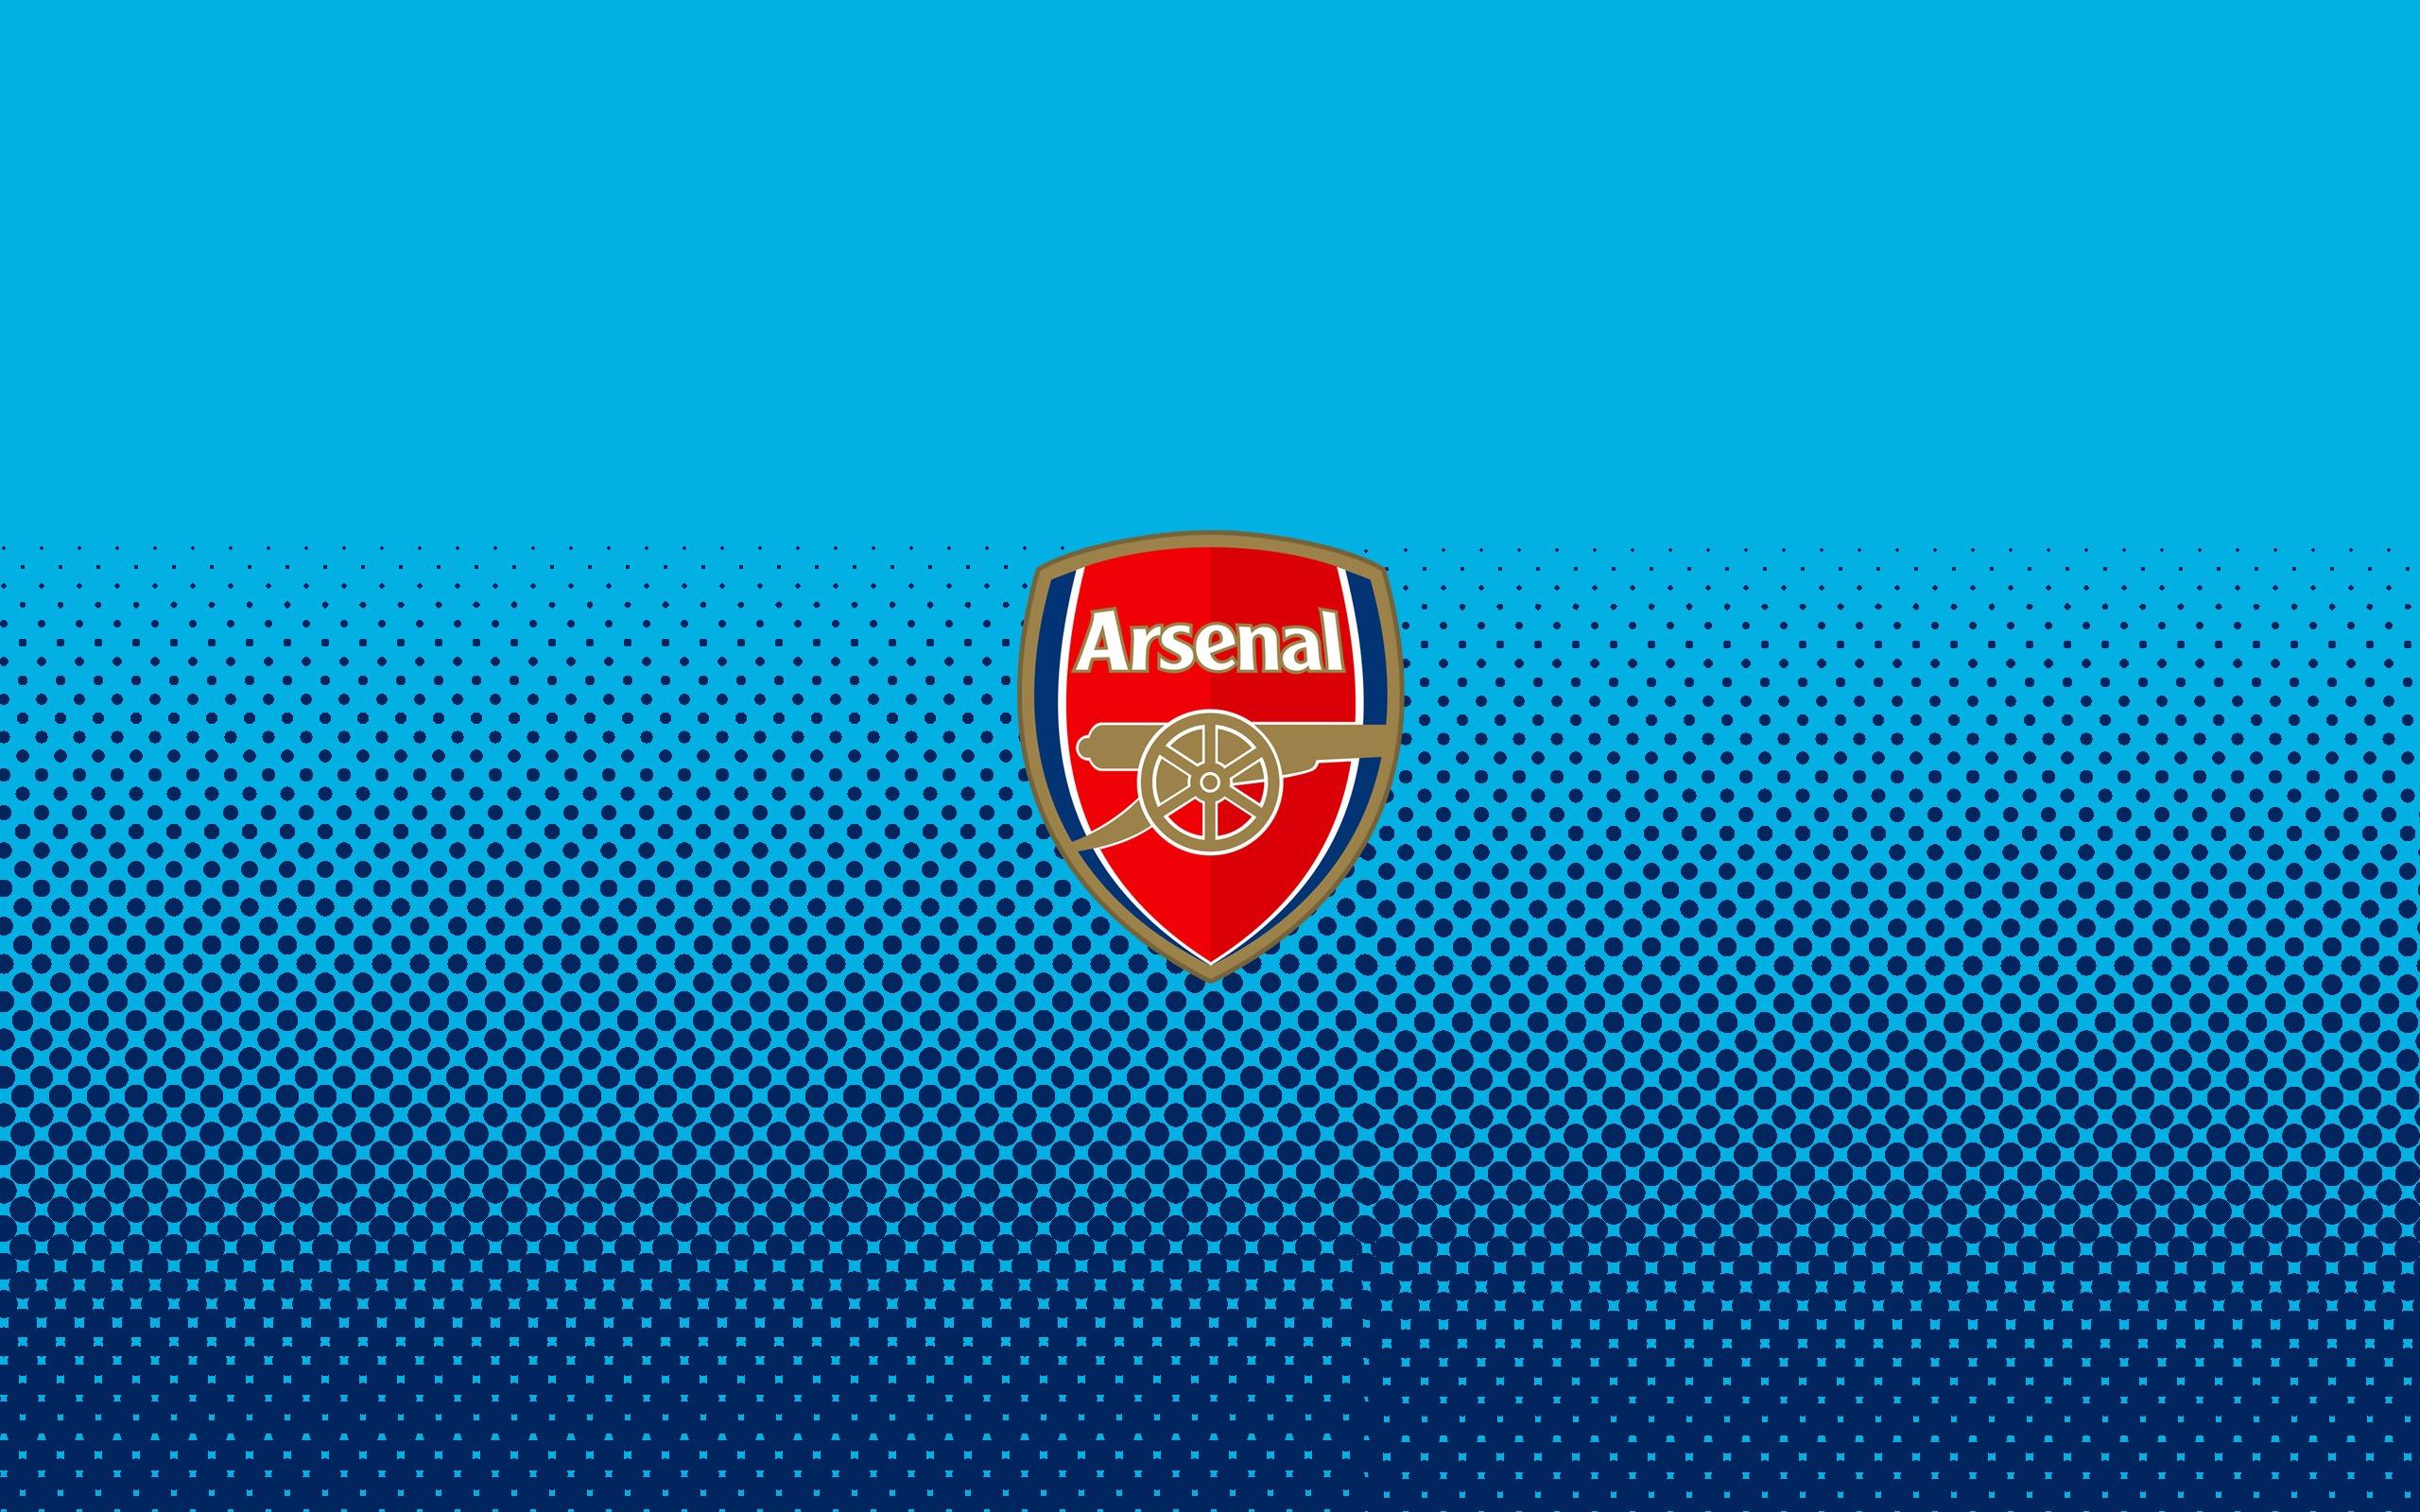 Arsenal-European Football Club HD Wallpapers Preview